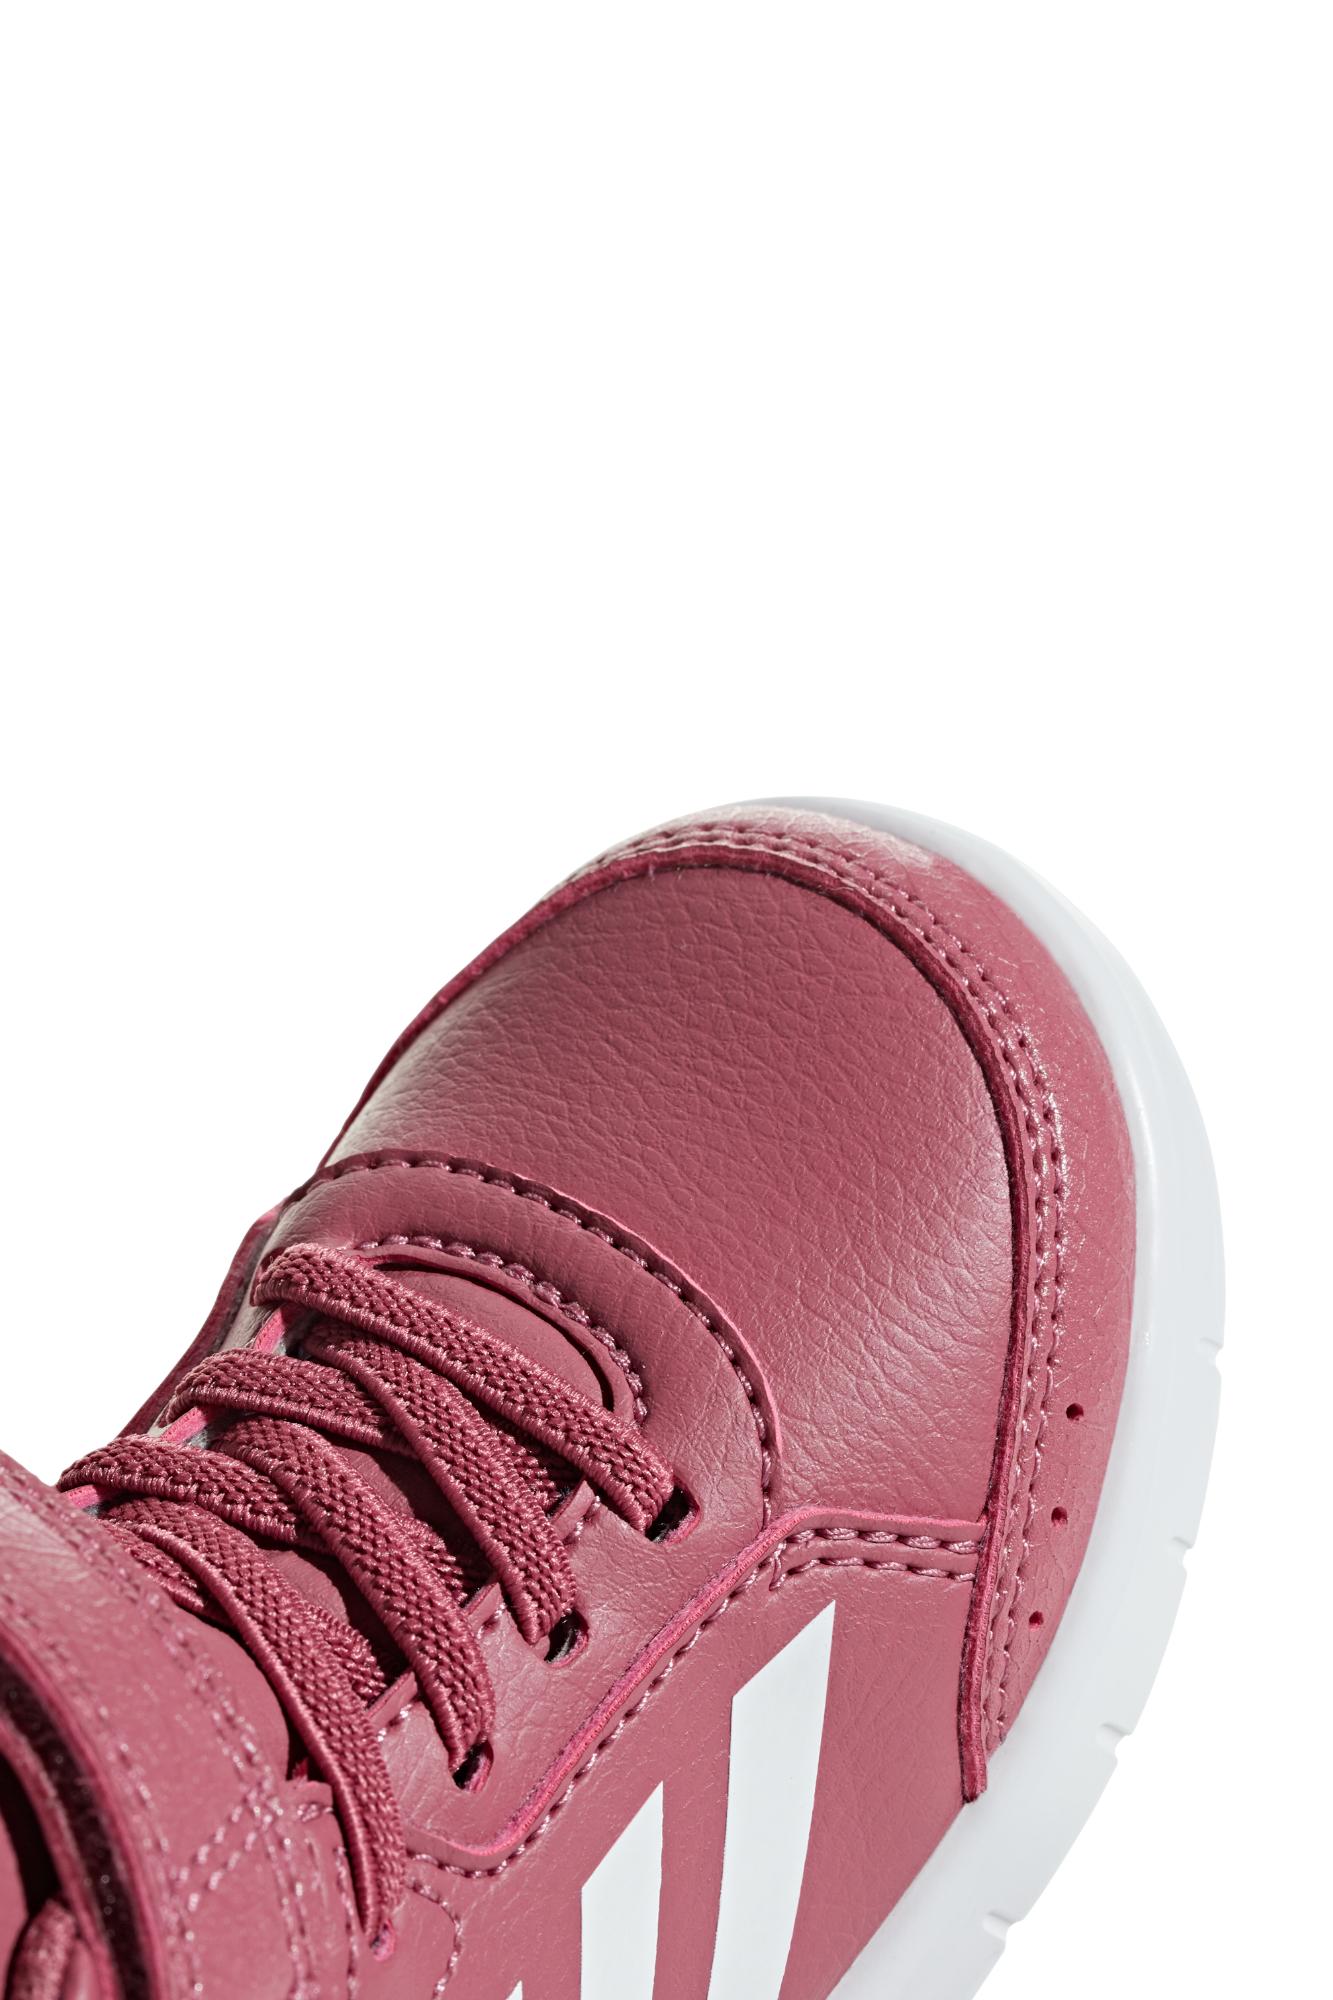 buy popular 1d0c9 16be3 ... Buty adidas AltaSport Mid EL - AH2551 ...